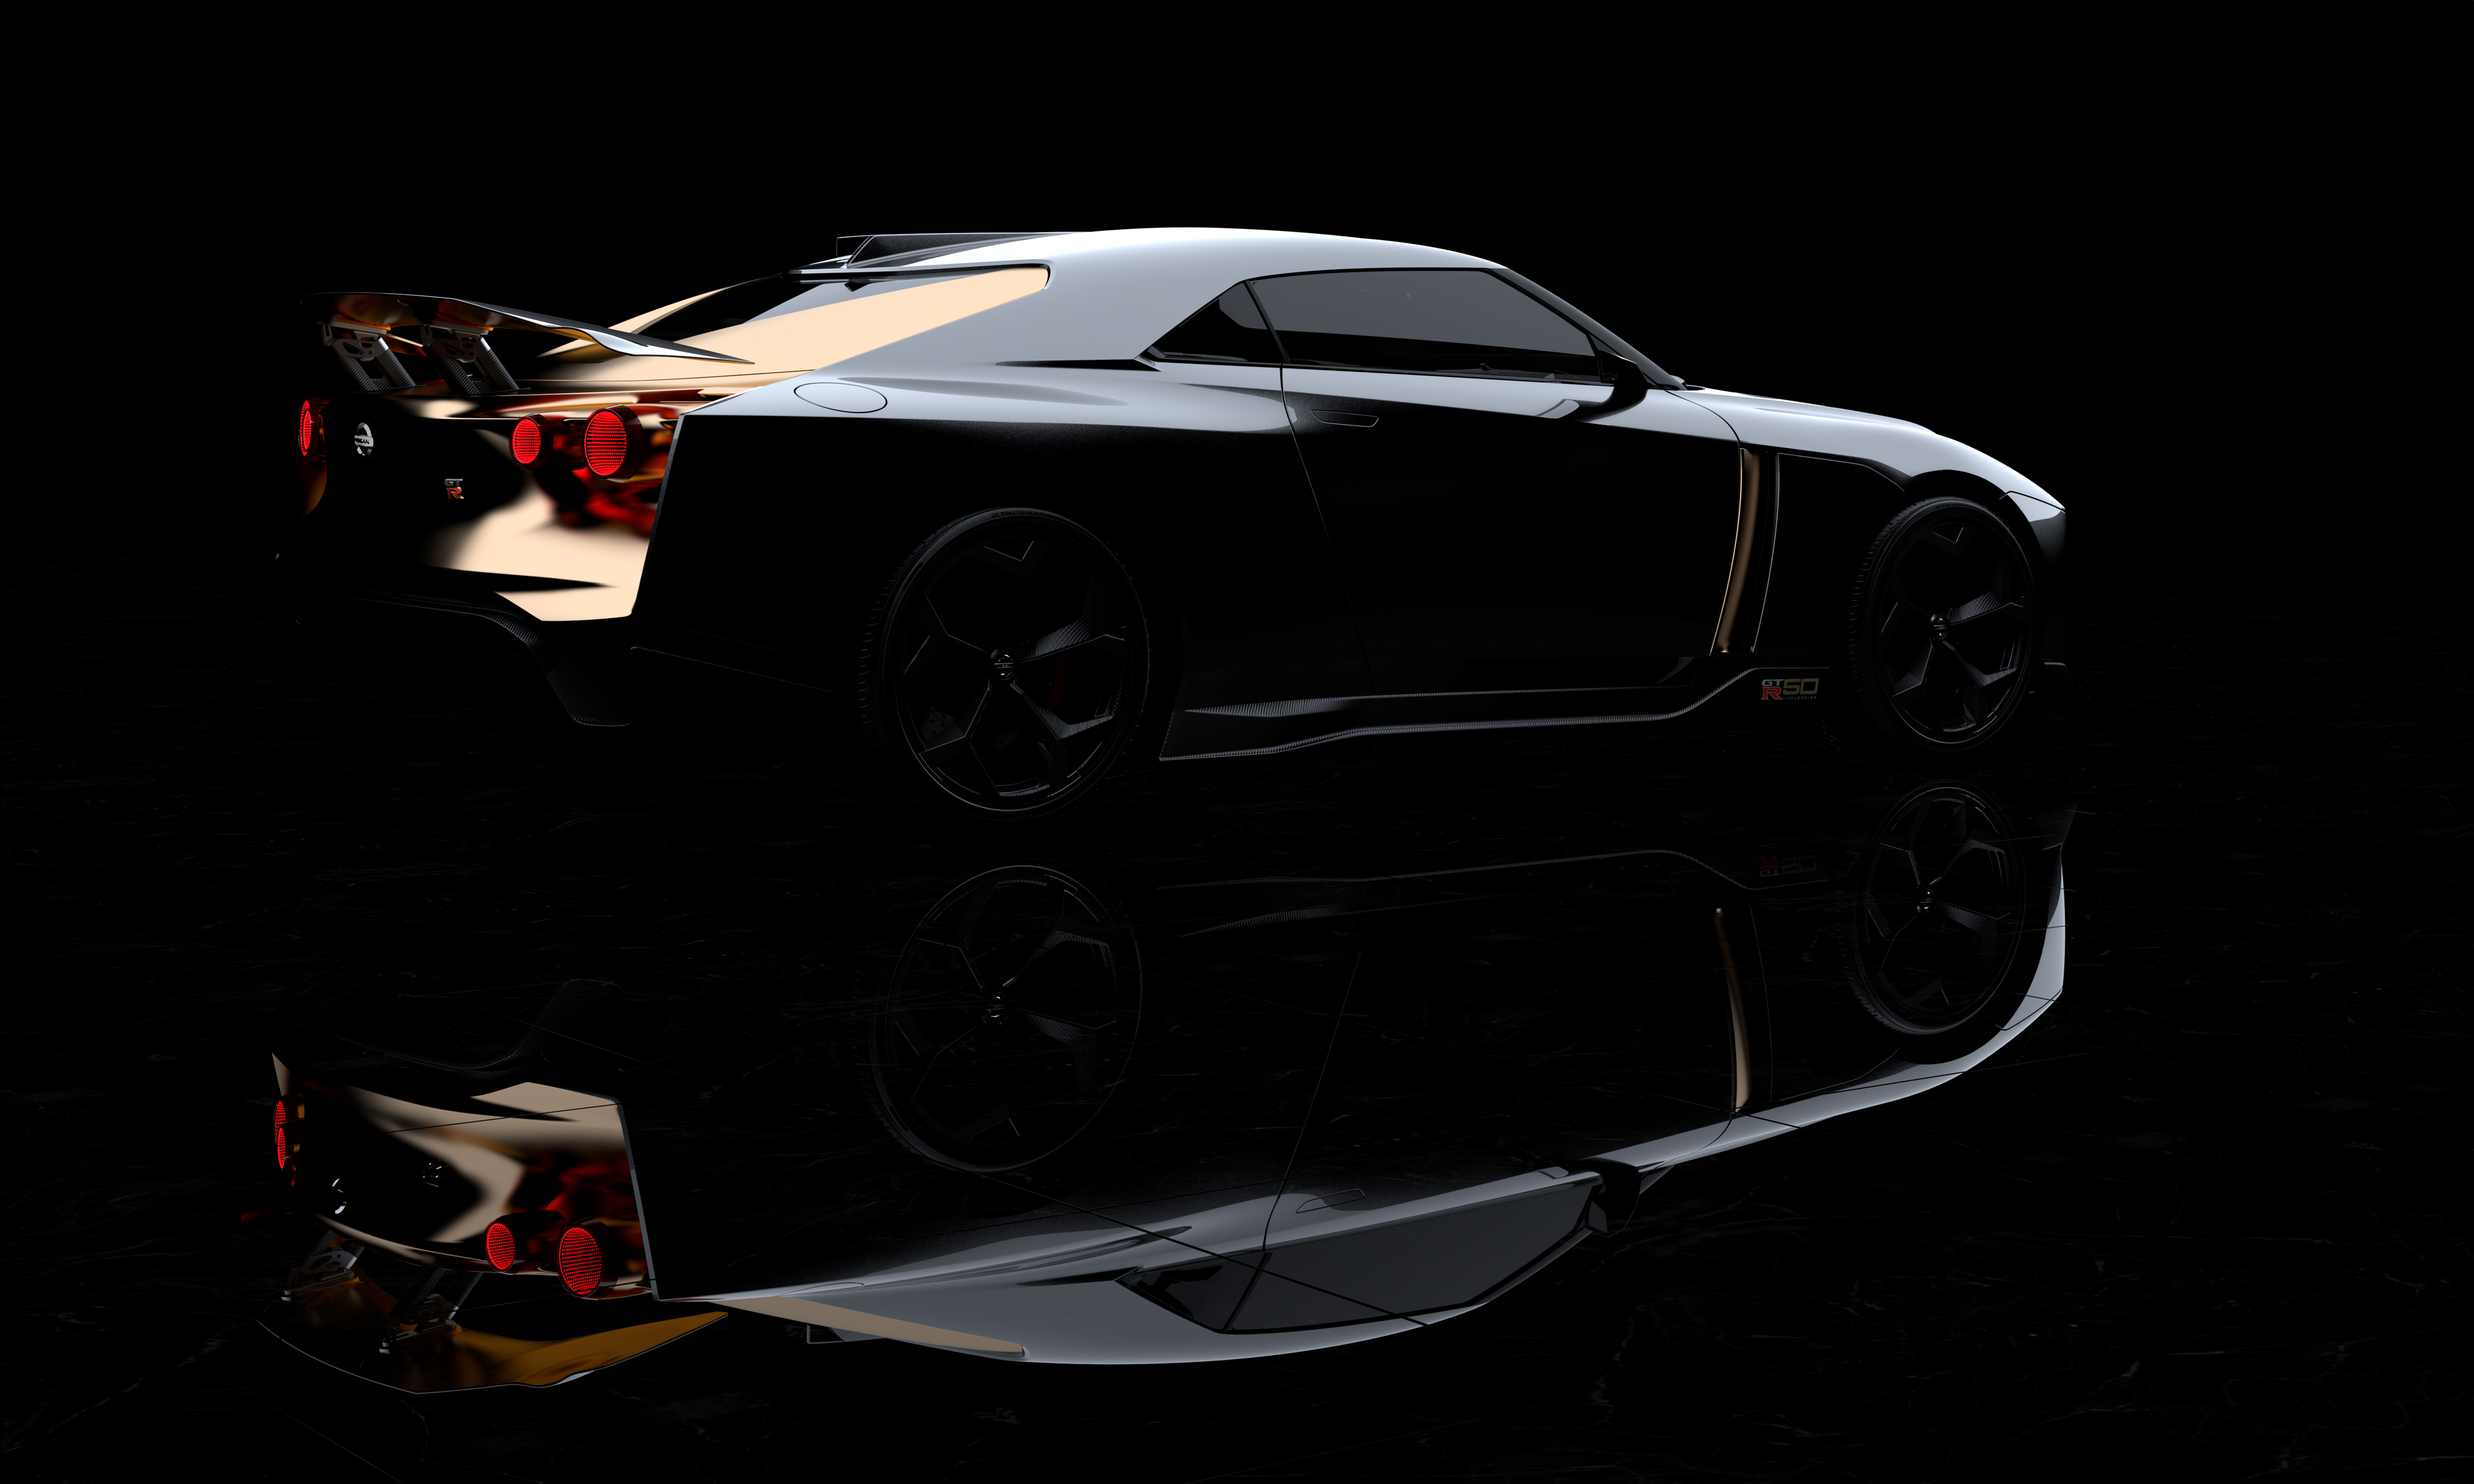 nissan gt-r50 concept side rear gt-r